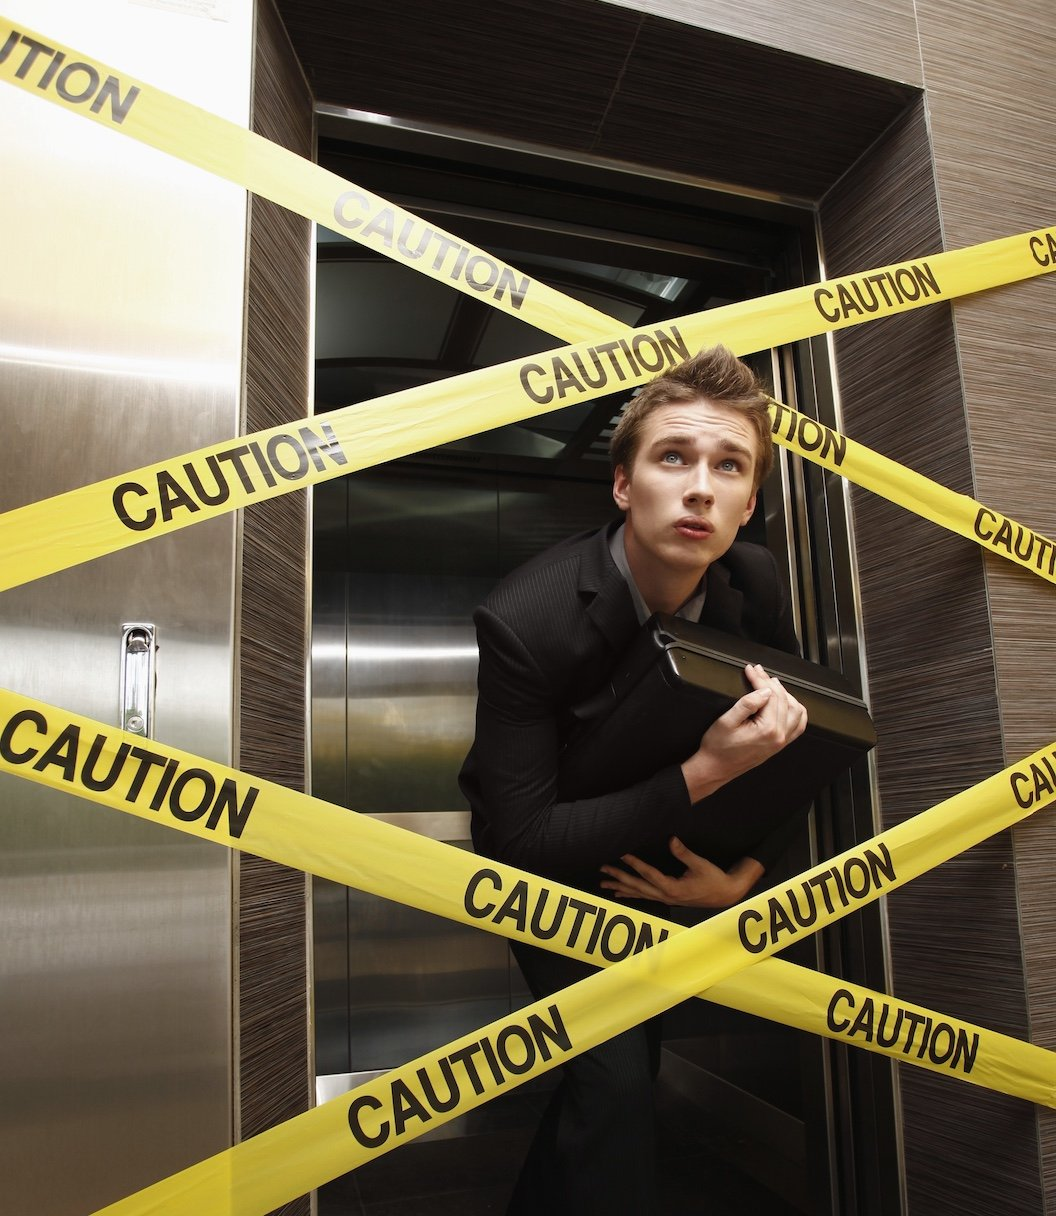 Elevator Mishap